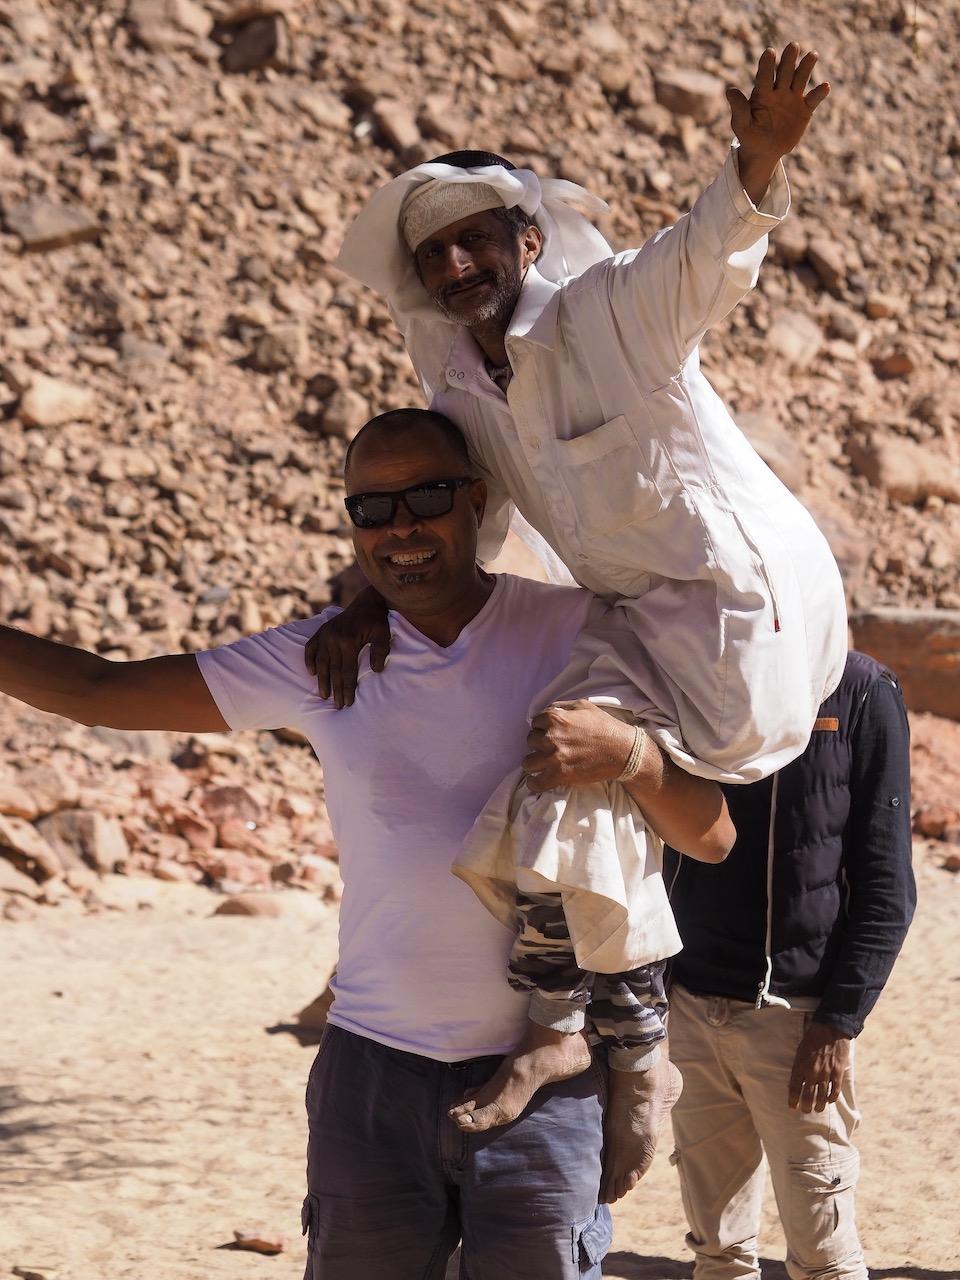 Taba: winterzon vakantiebestemming in Egypte- zuidelijke Sinai.